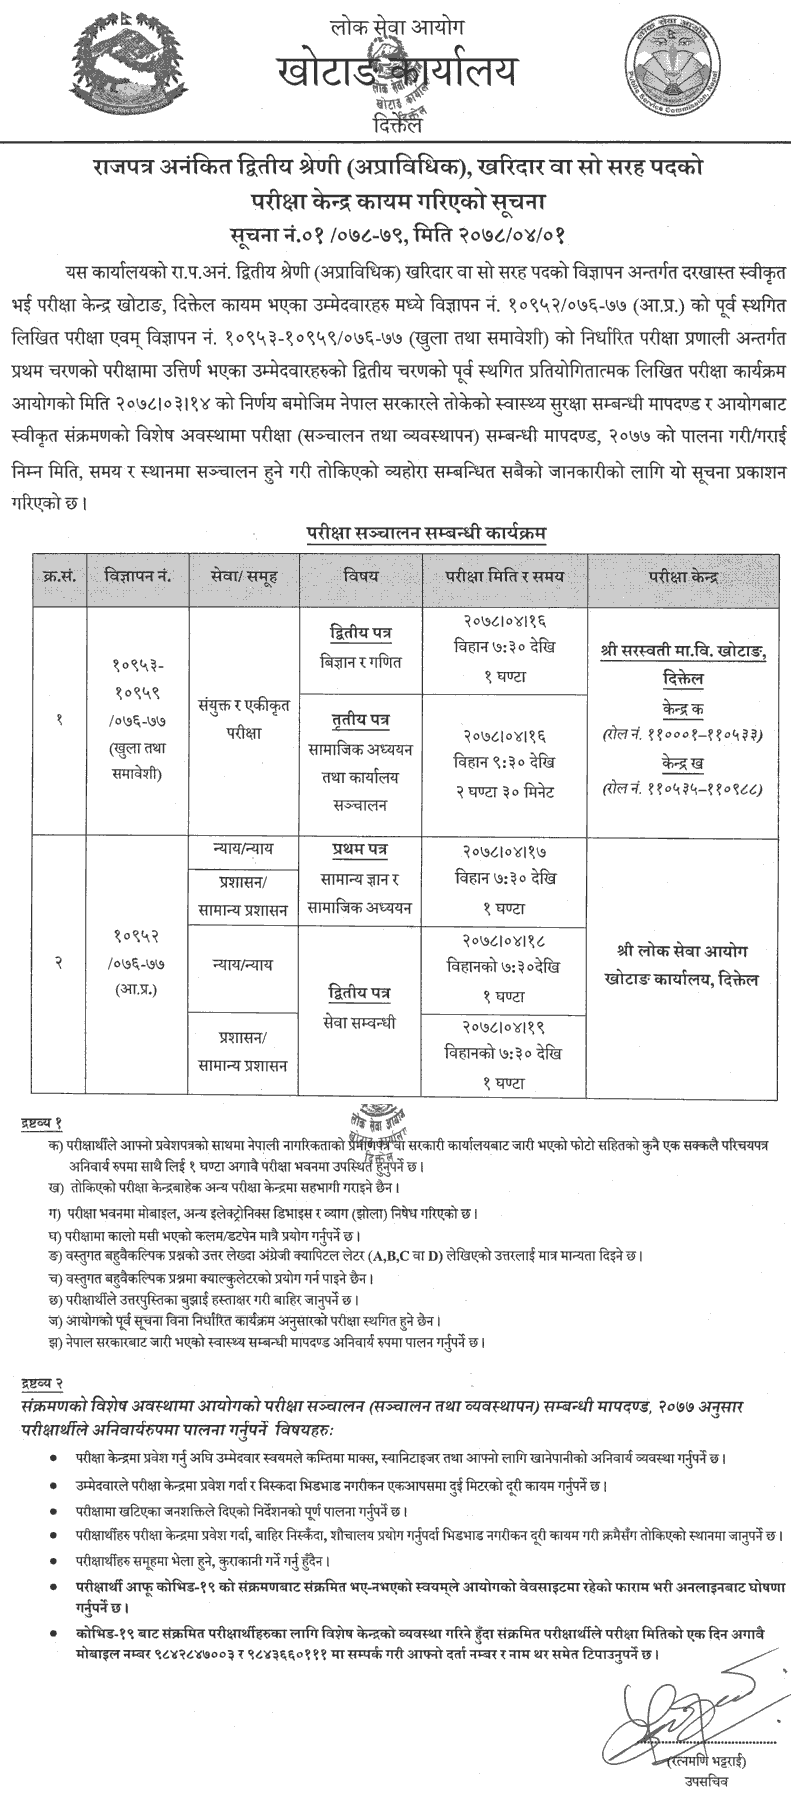 5) Lok Sewa Aayog Khotang (Kharidar Second Phase Written Exam Center)